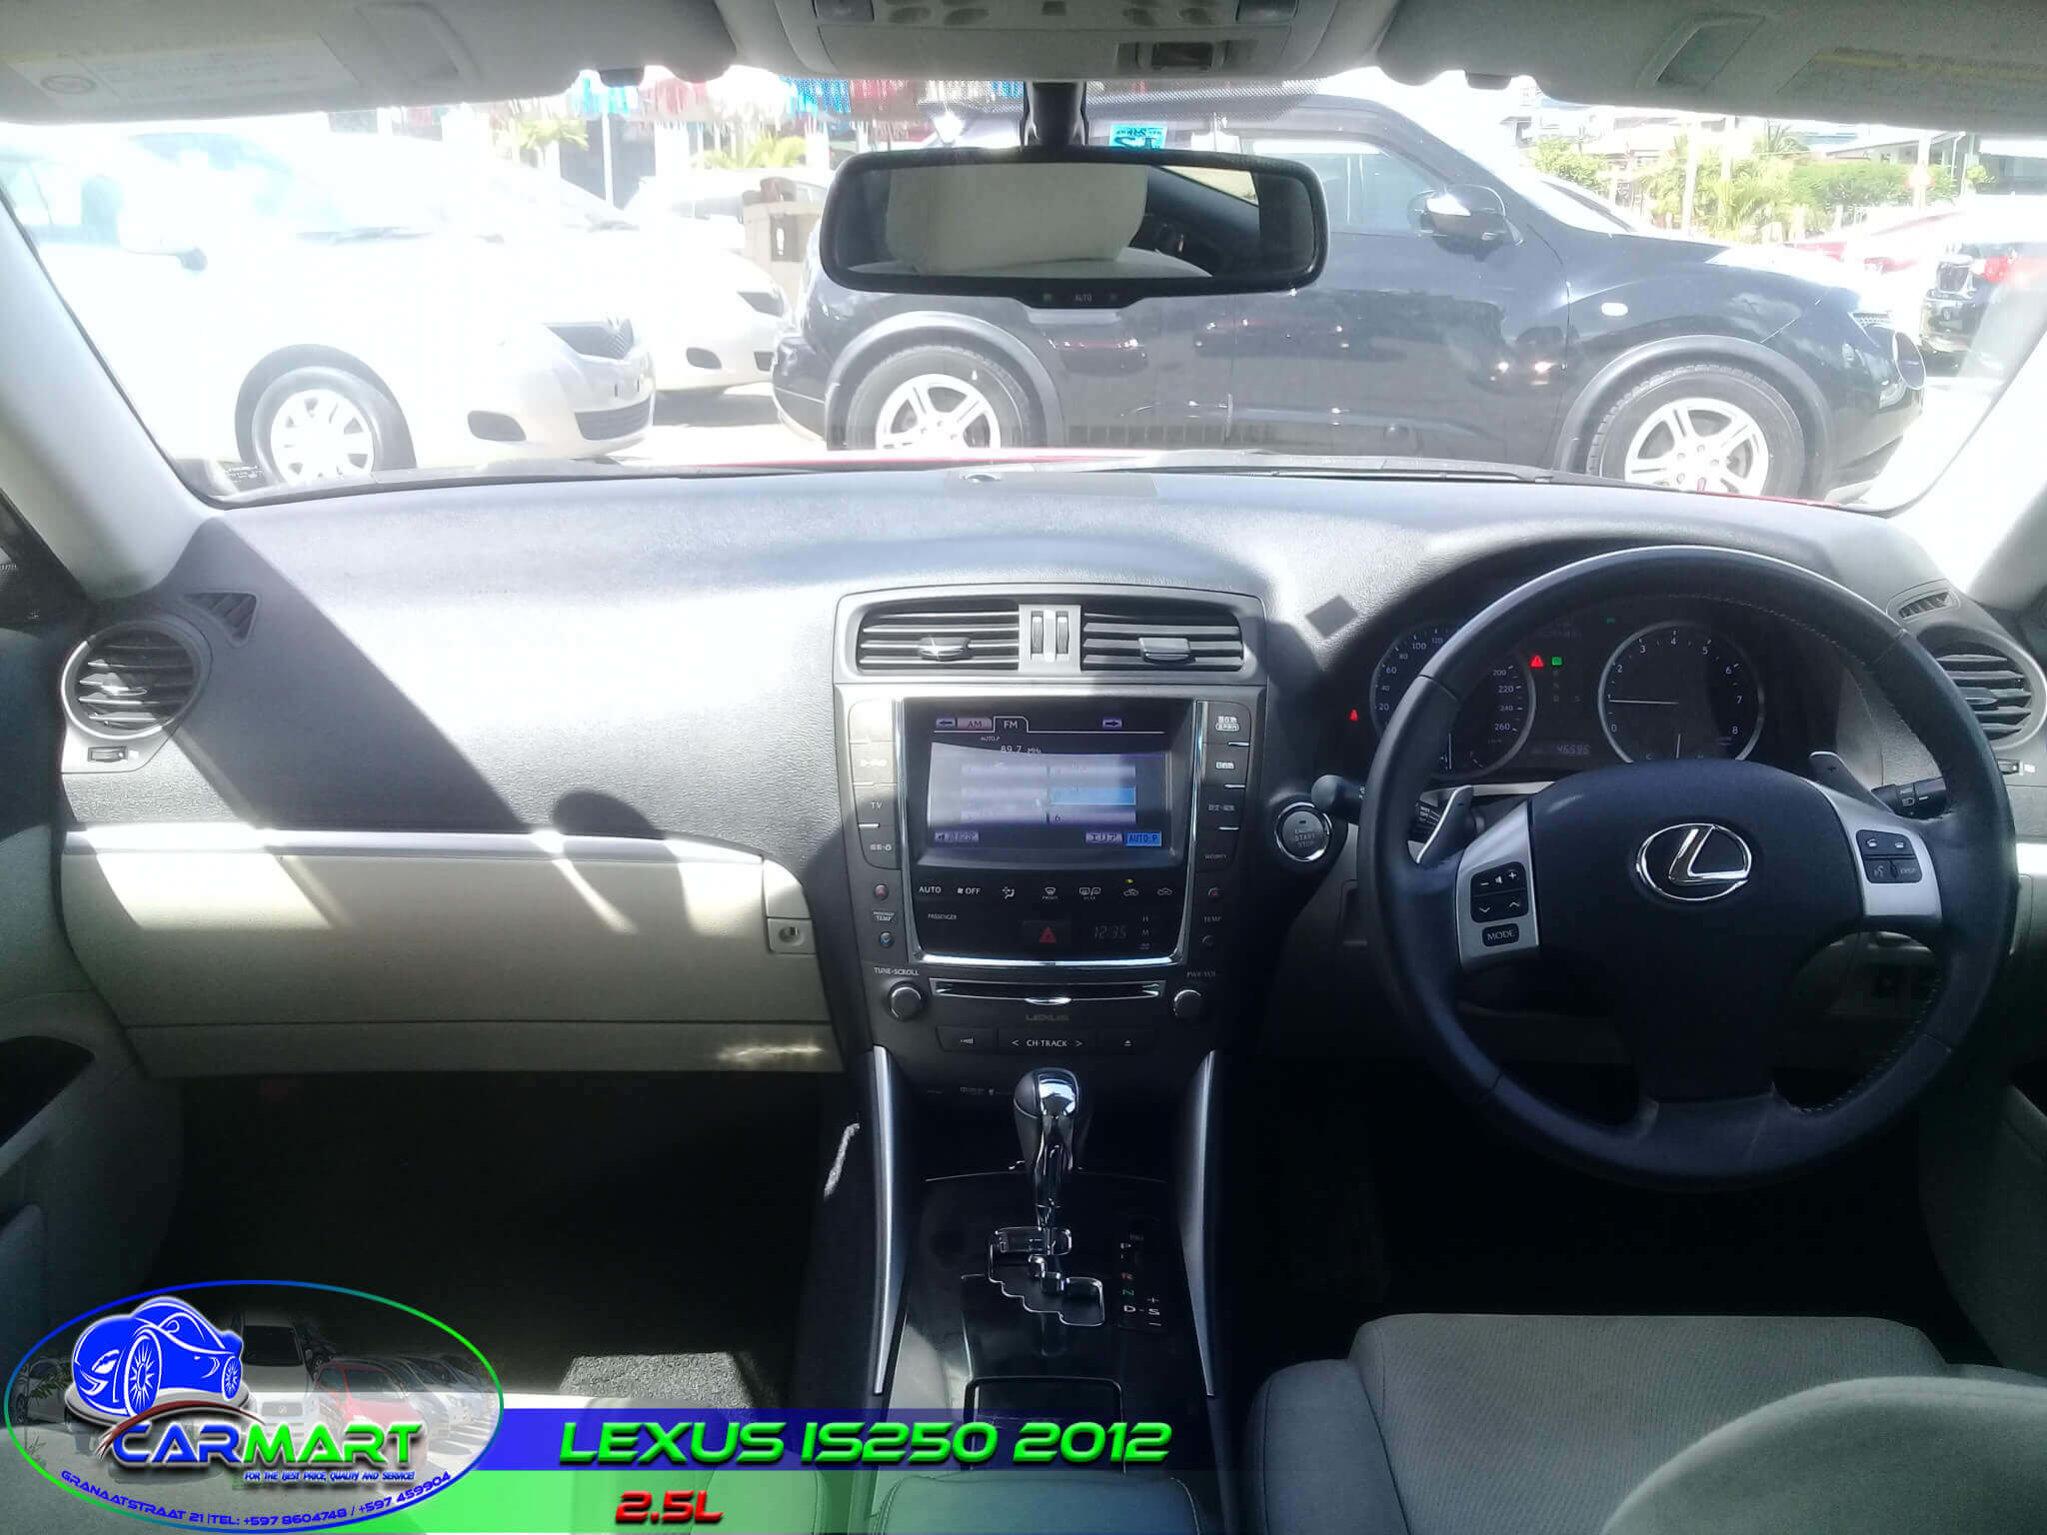 LEXUS IS250 2012 – Carmart Suriname